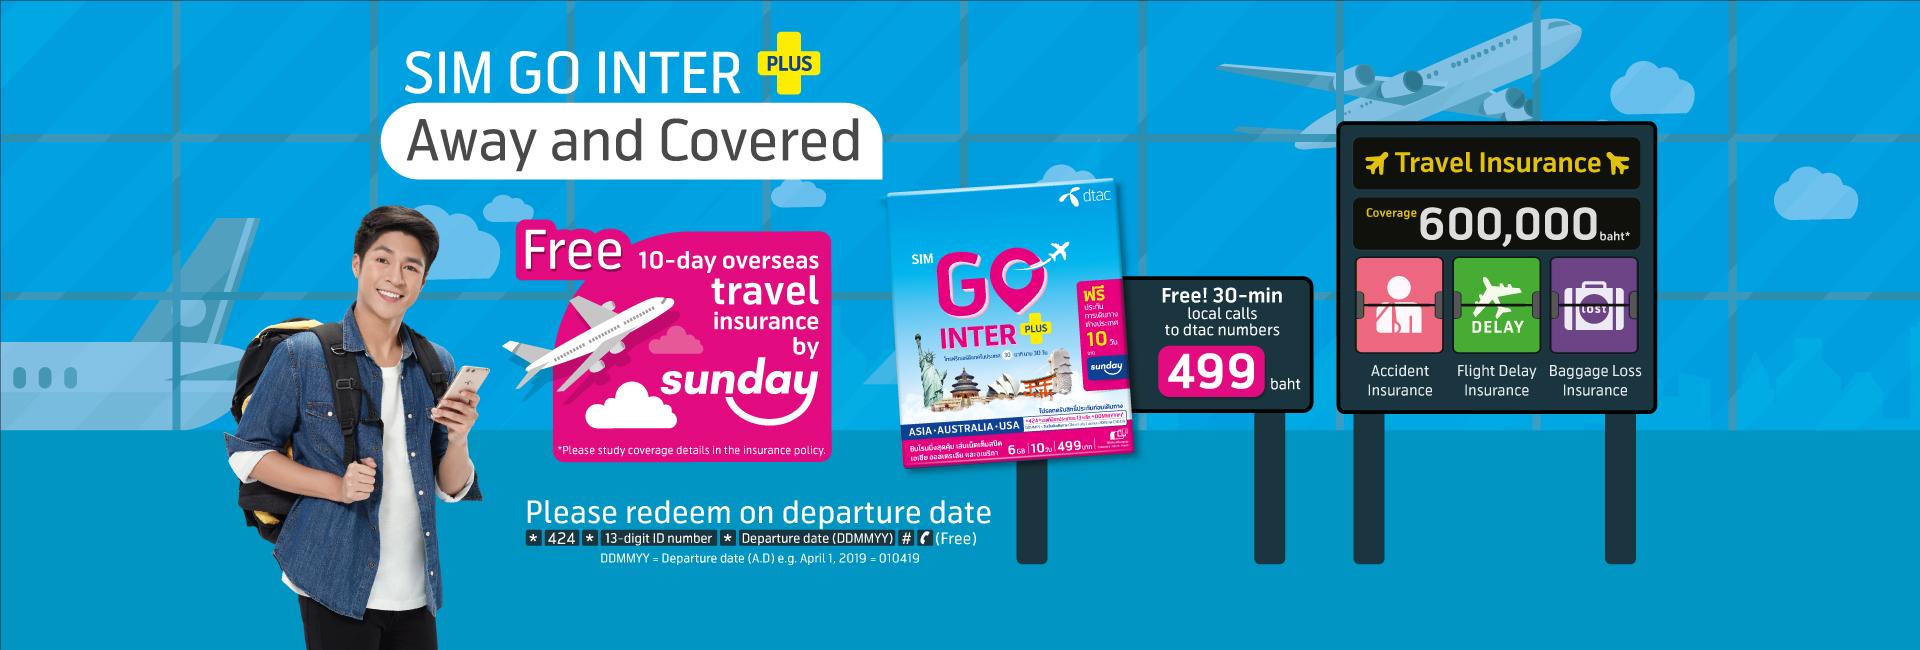 SIM GO INTER, Go abroad by international roaming sim | dtac